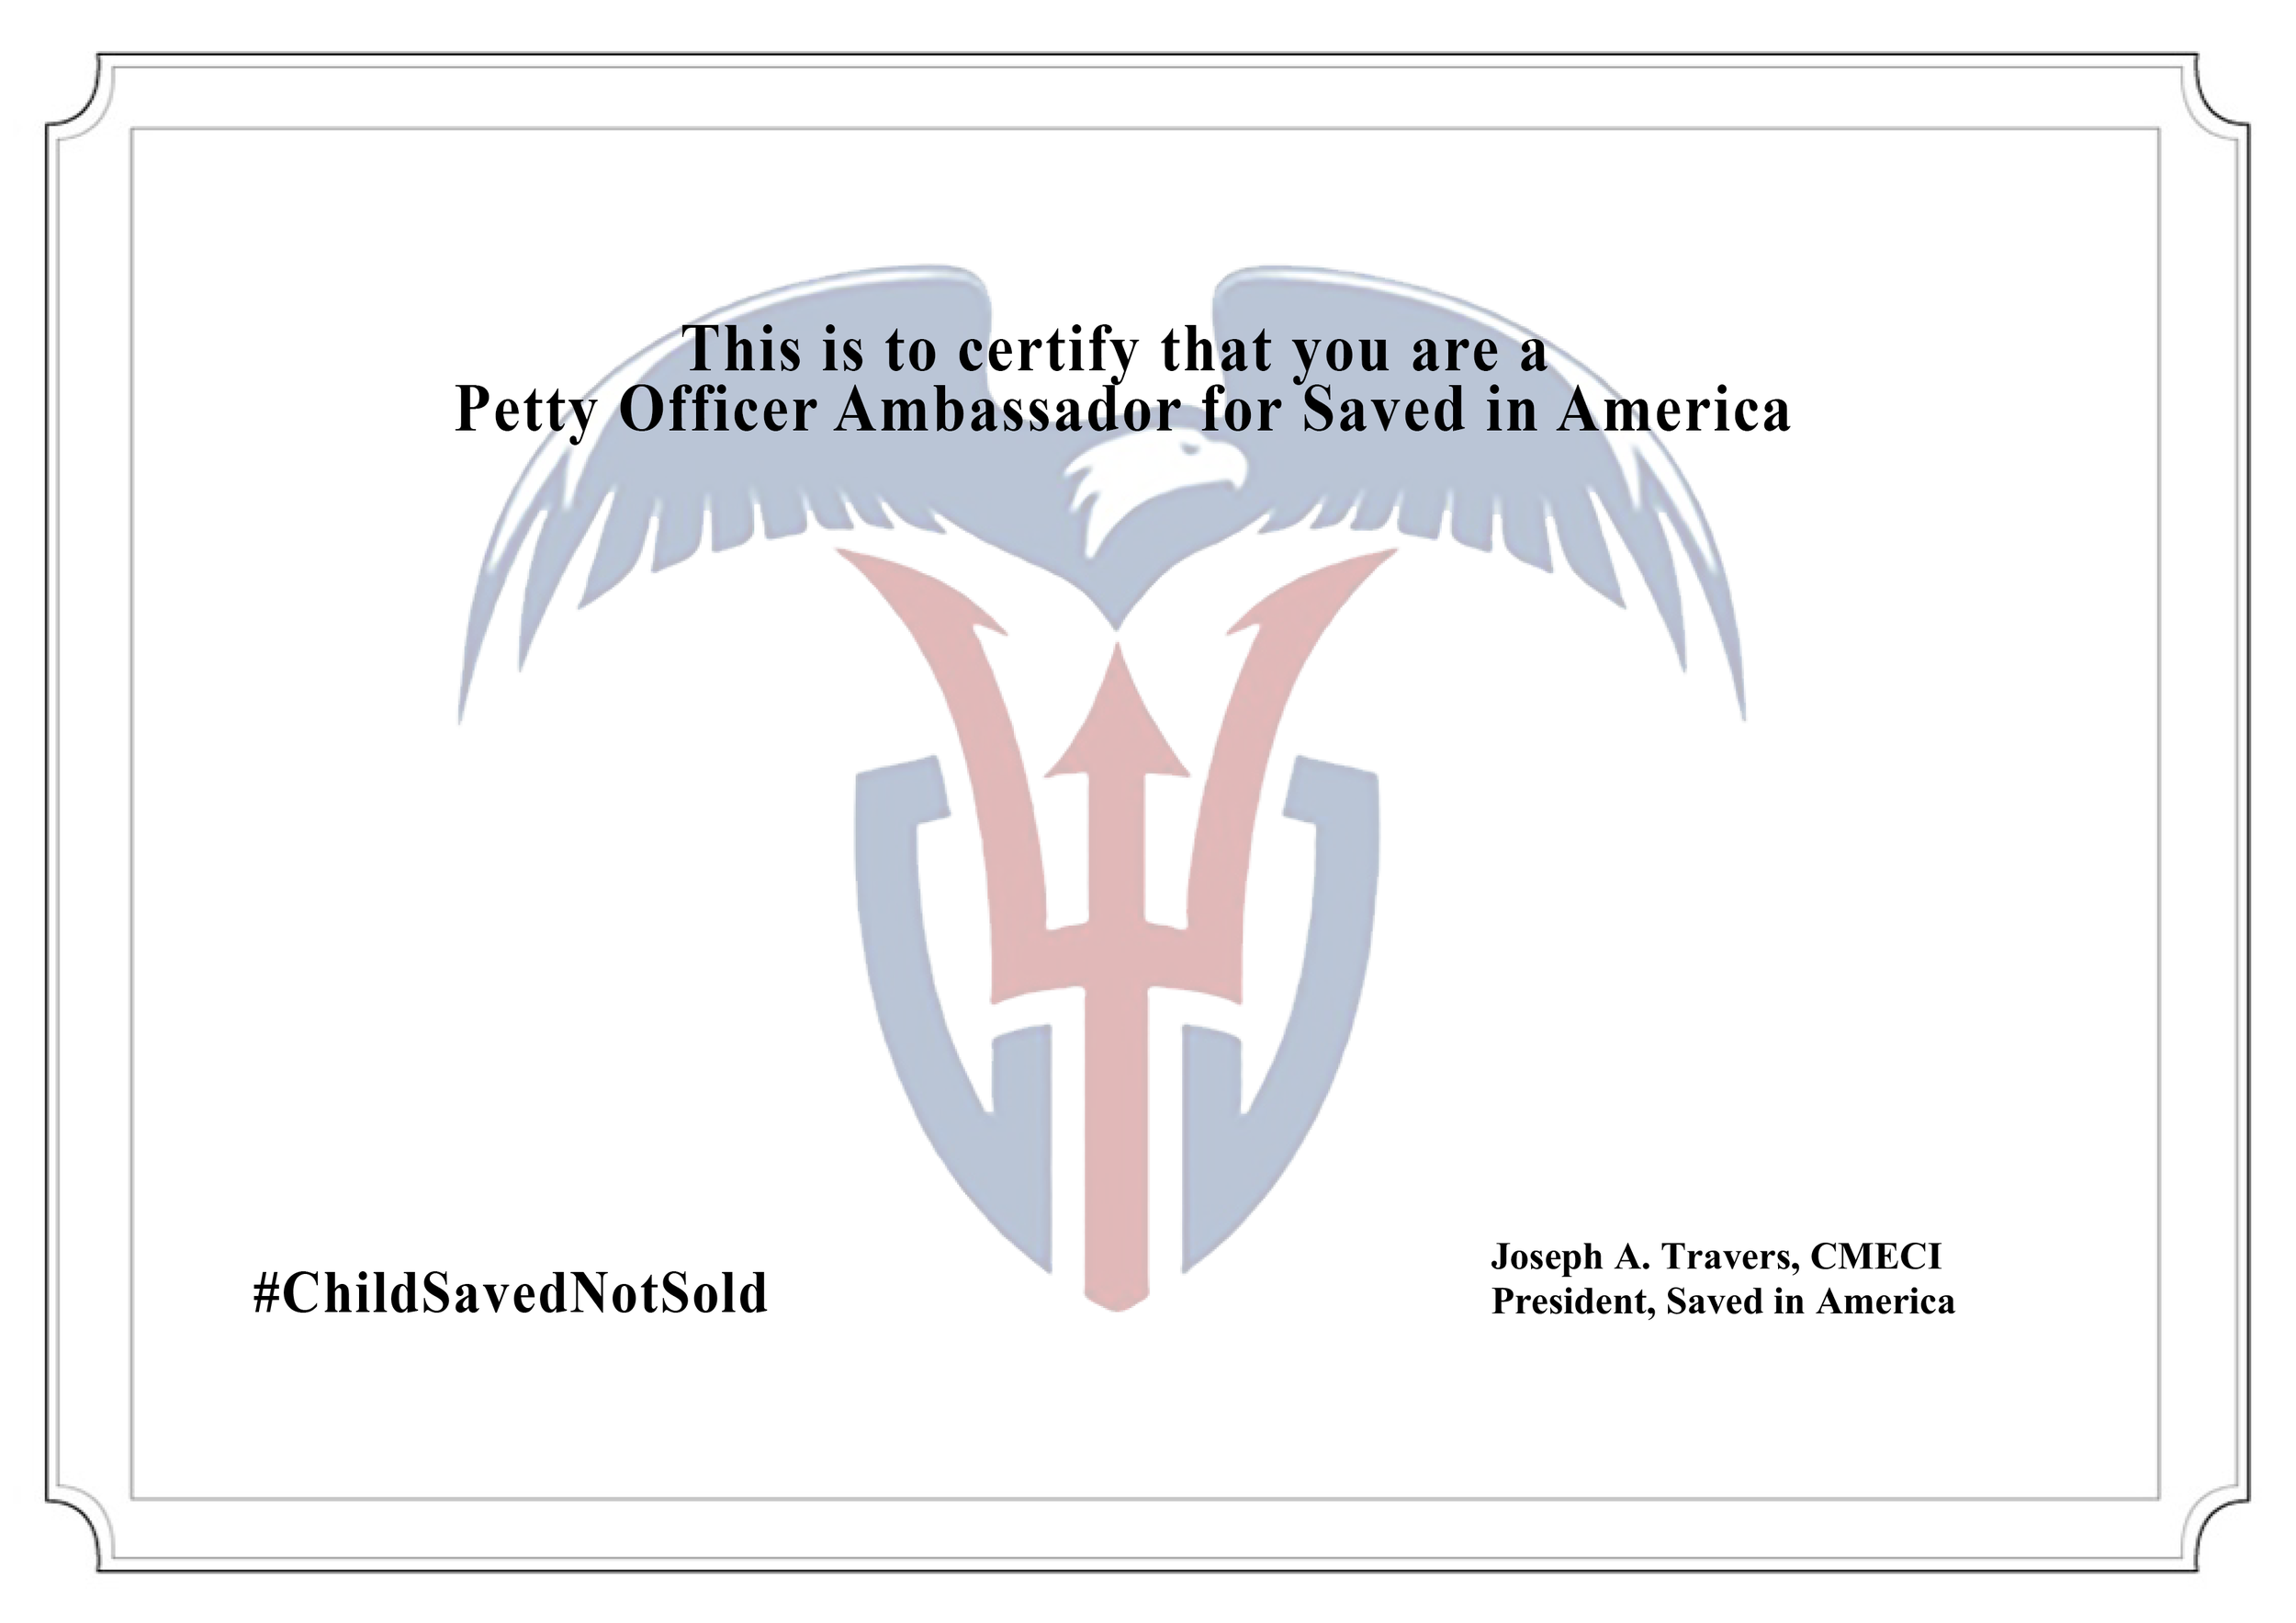 PettyOfficerAmbassadorCertificate.png